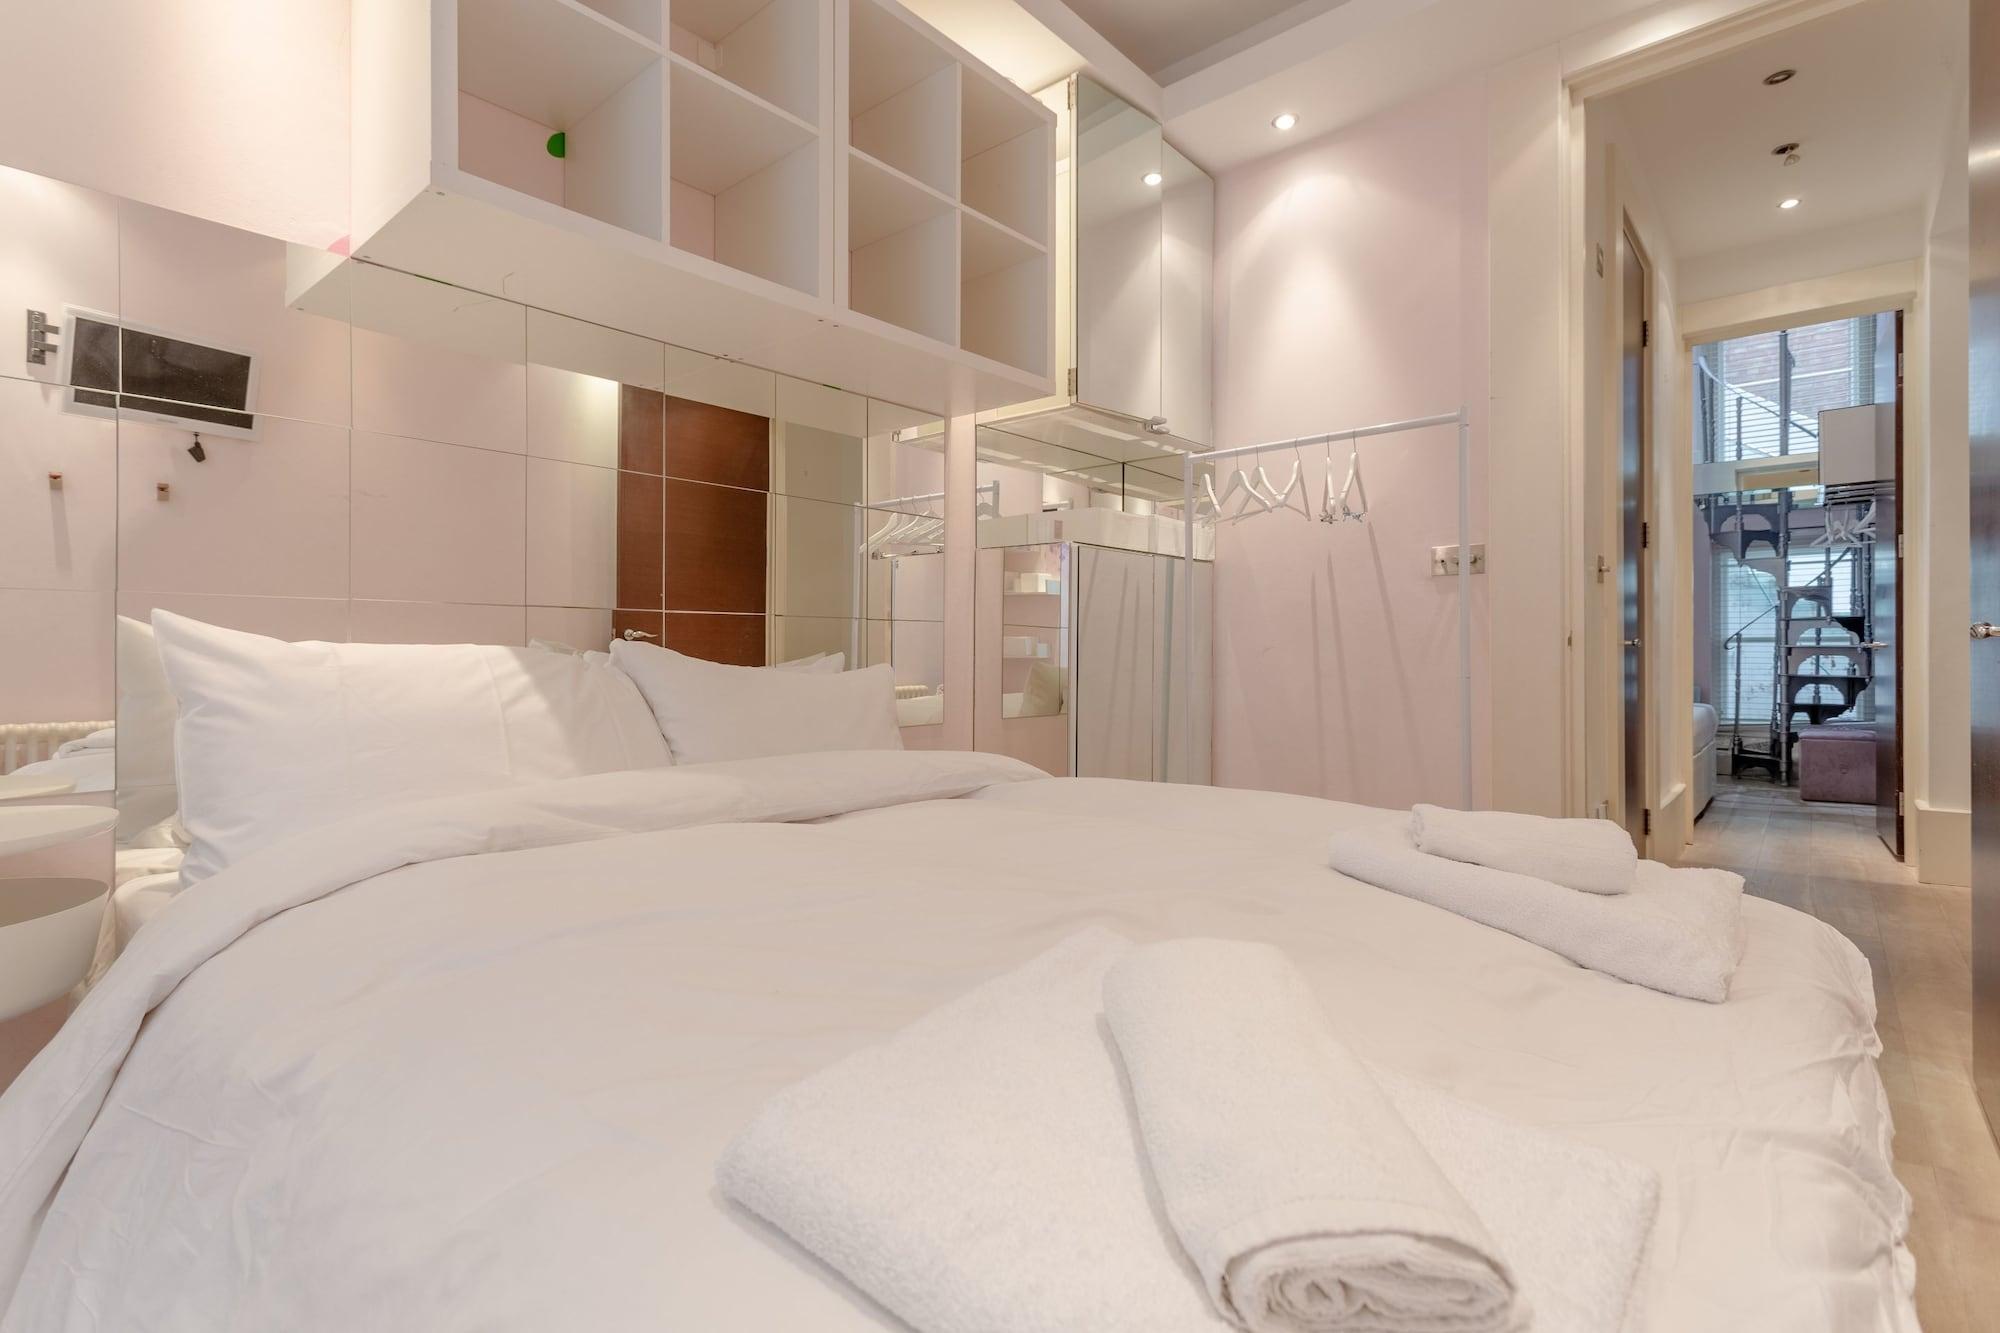 Stylish 3 Bedroom Home in Hampstead, London